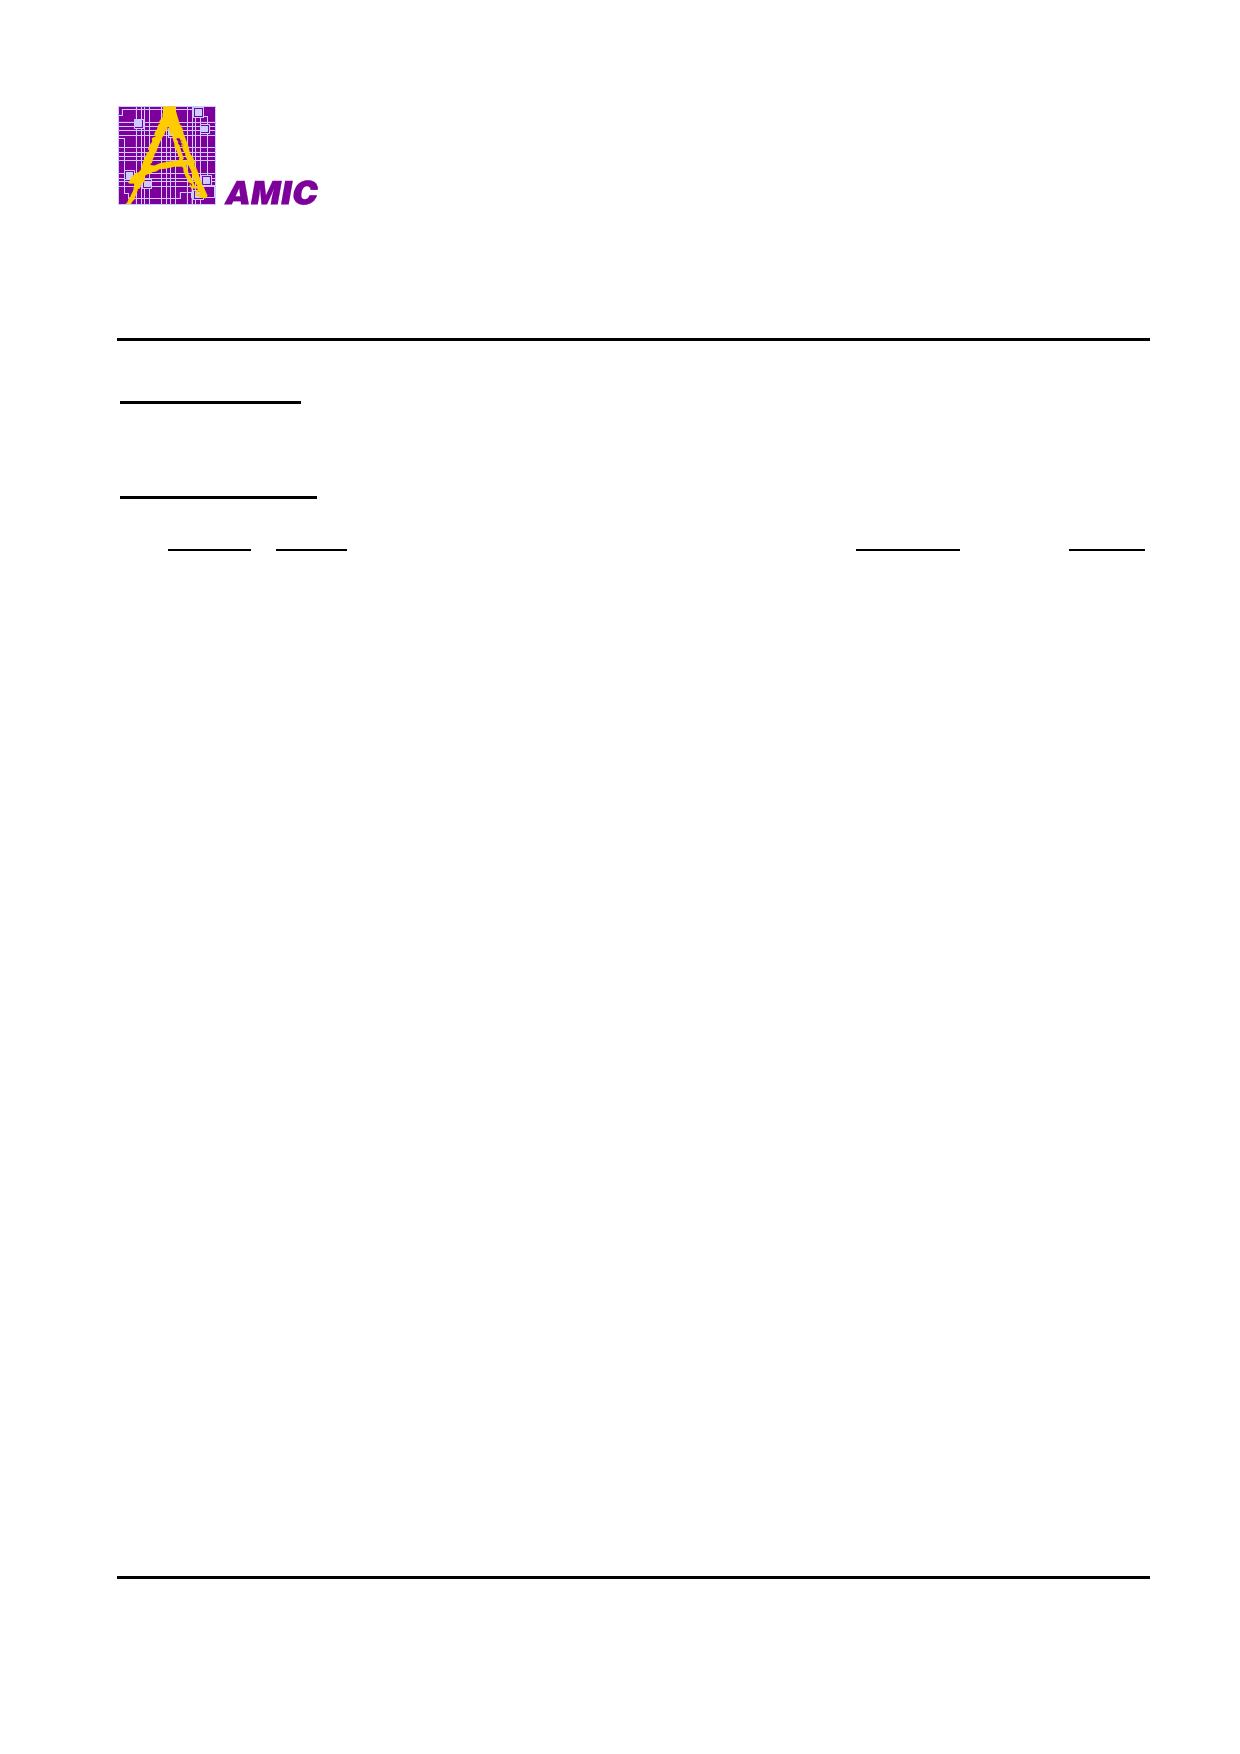 A290011B datasheet, circuit